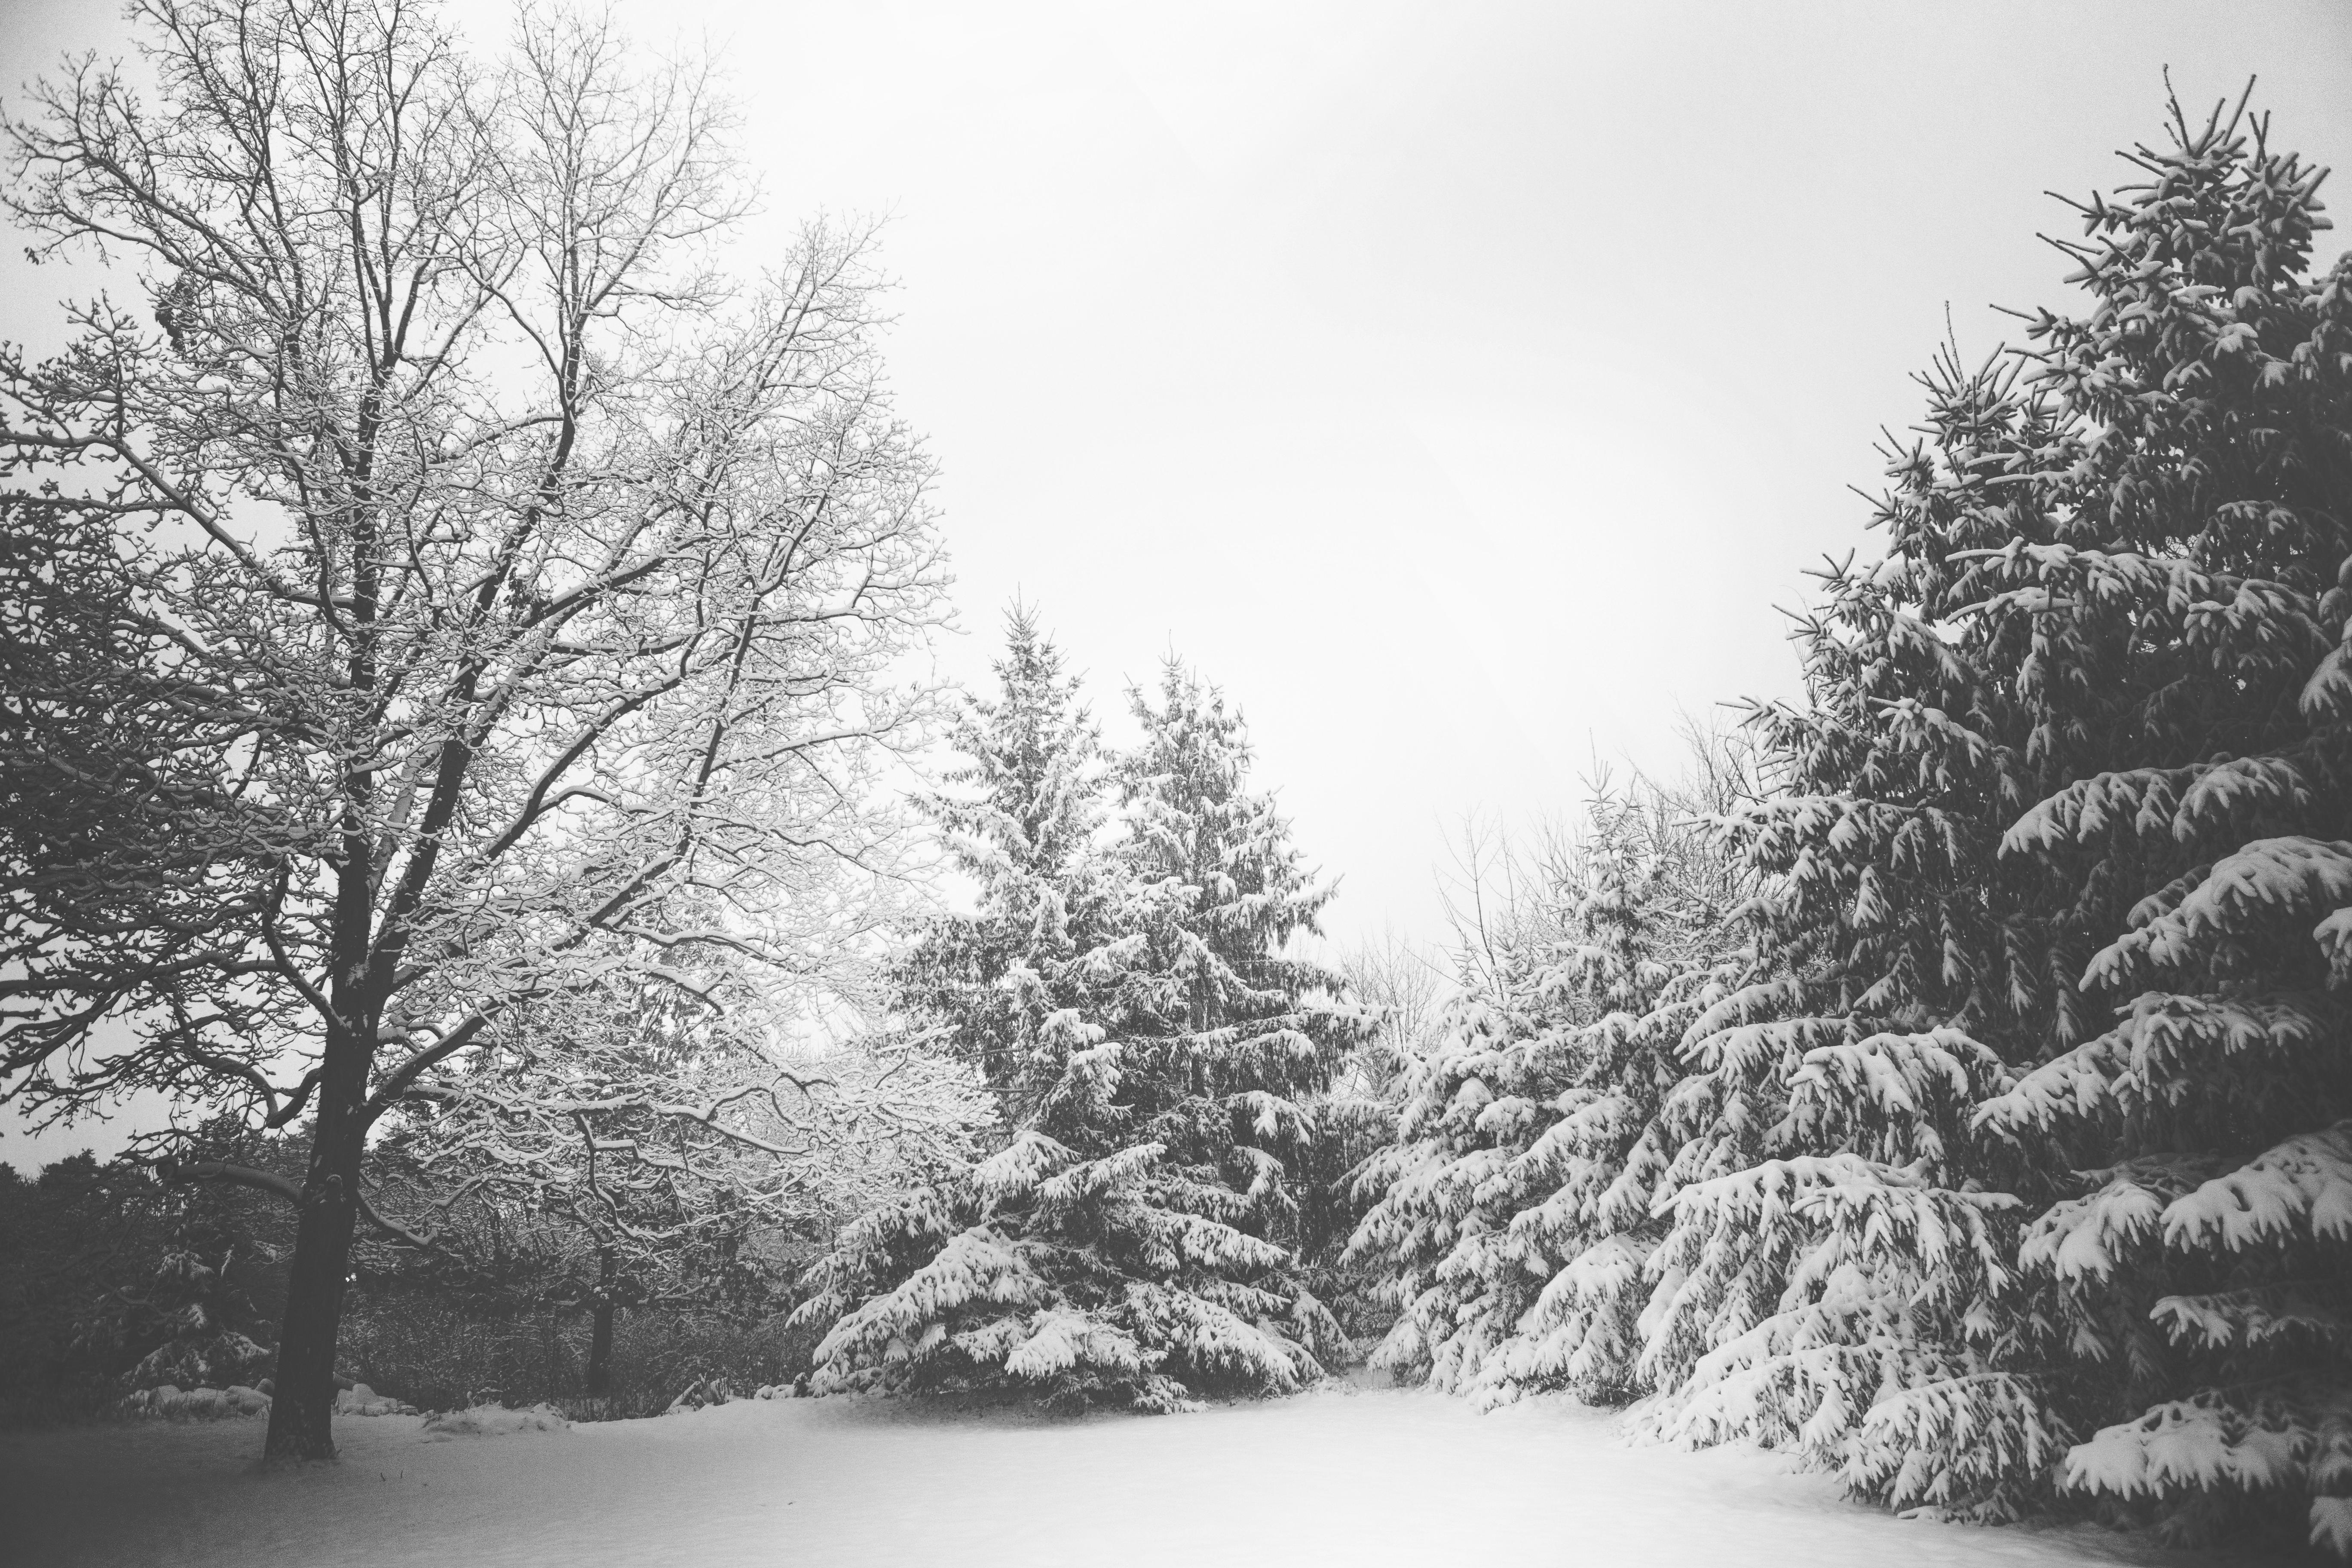 free images landscape tree forest branch snow winter black